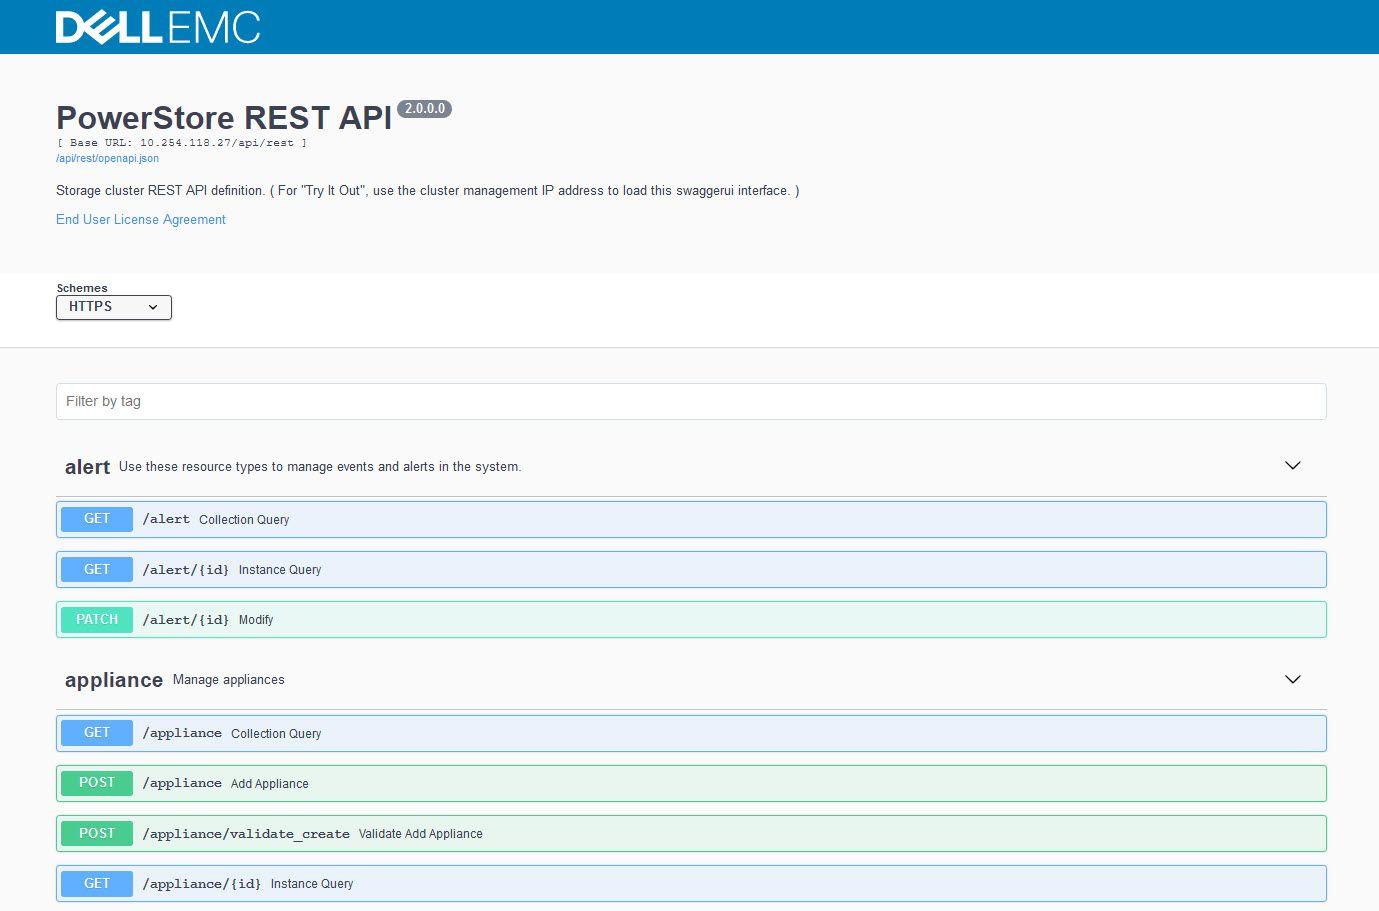 PowerStore Rest API